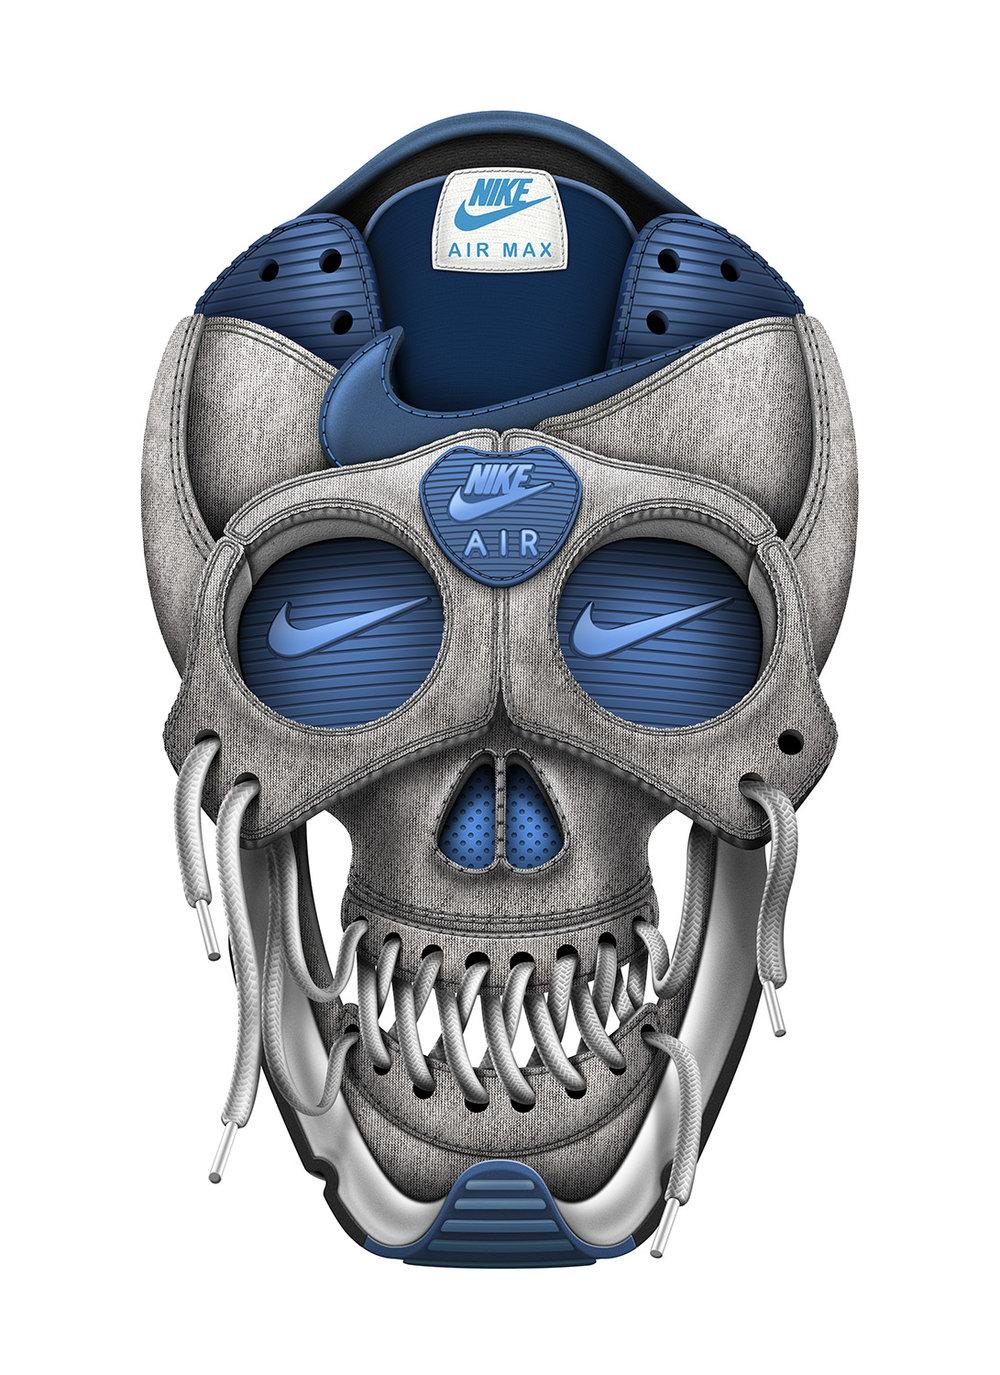 130925_Nike_skull_airmax_grey-blue_02.jpg